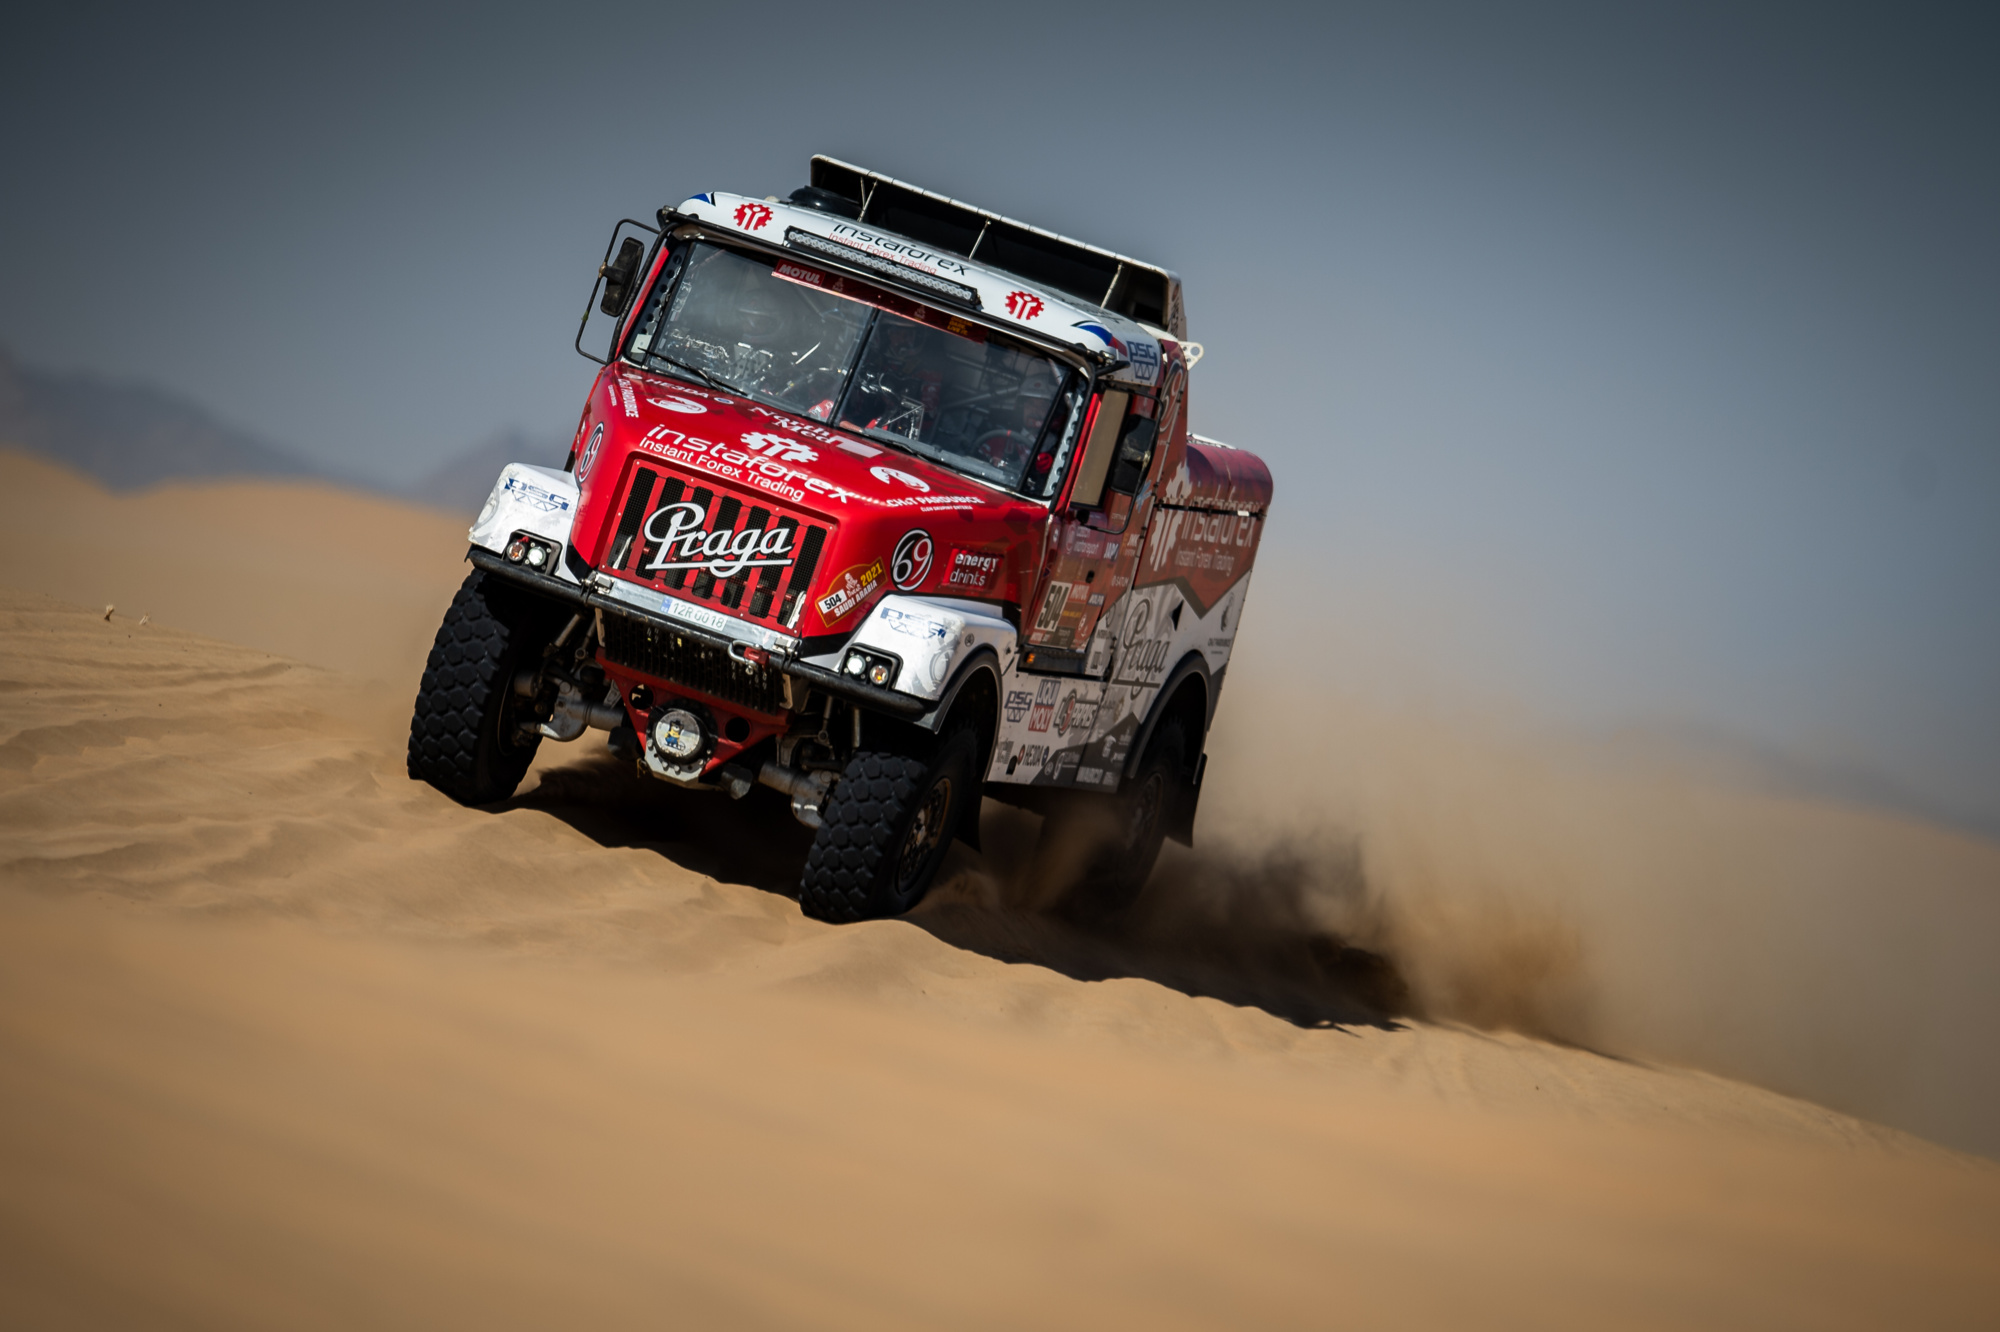 Dakar 2021: Loprais' efforts slowed down by puncture